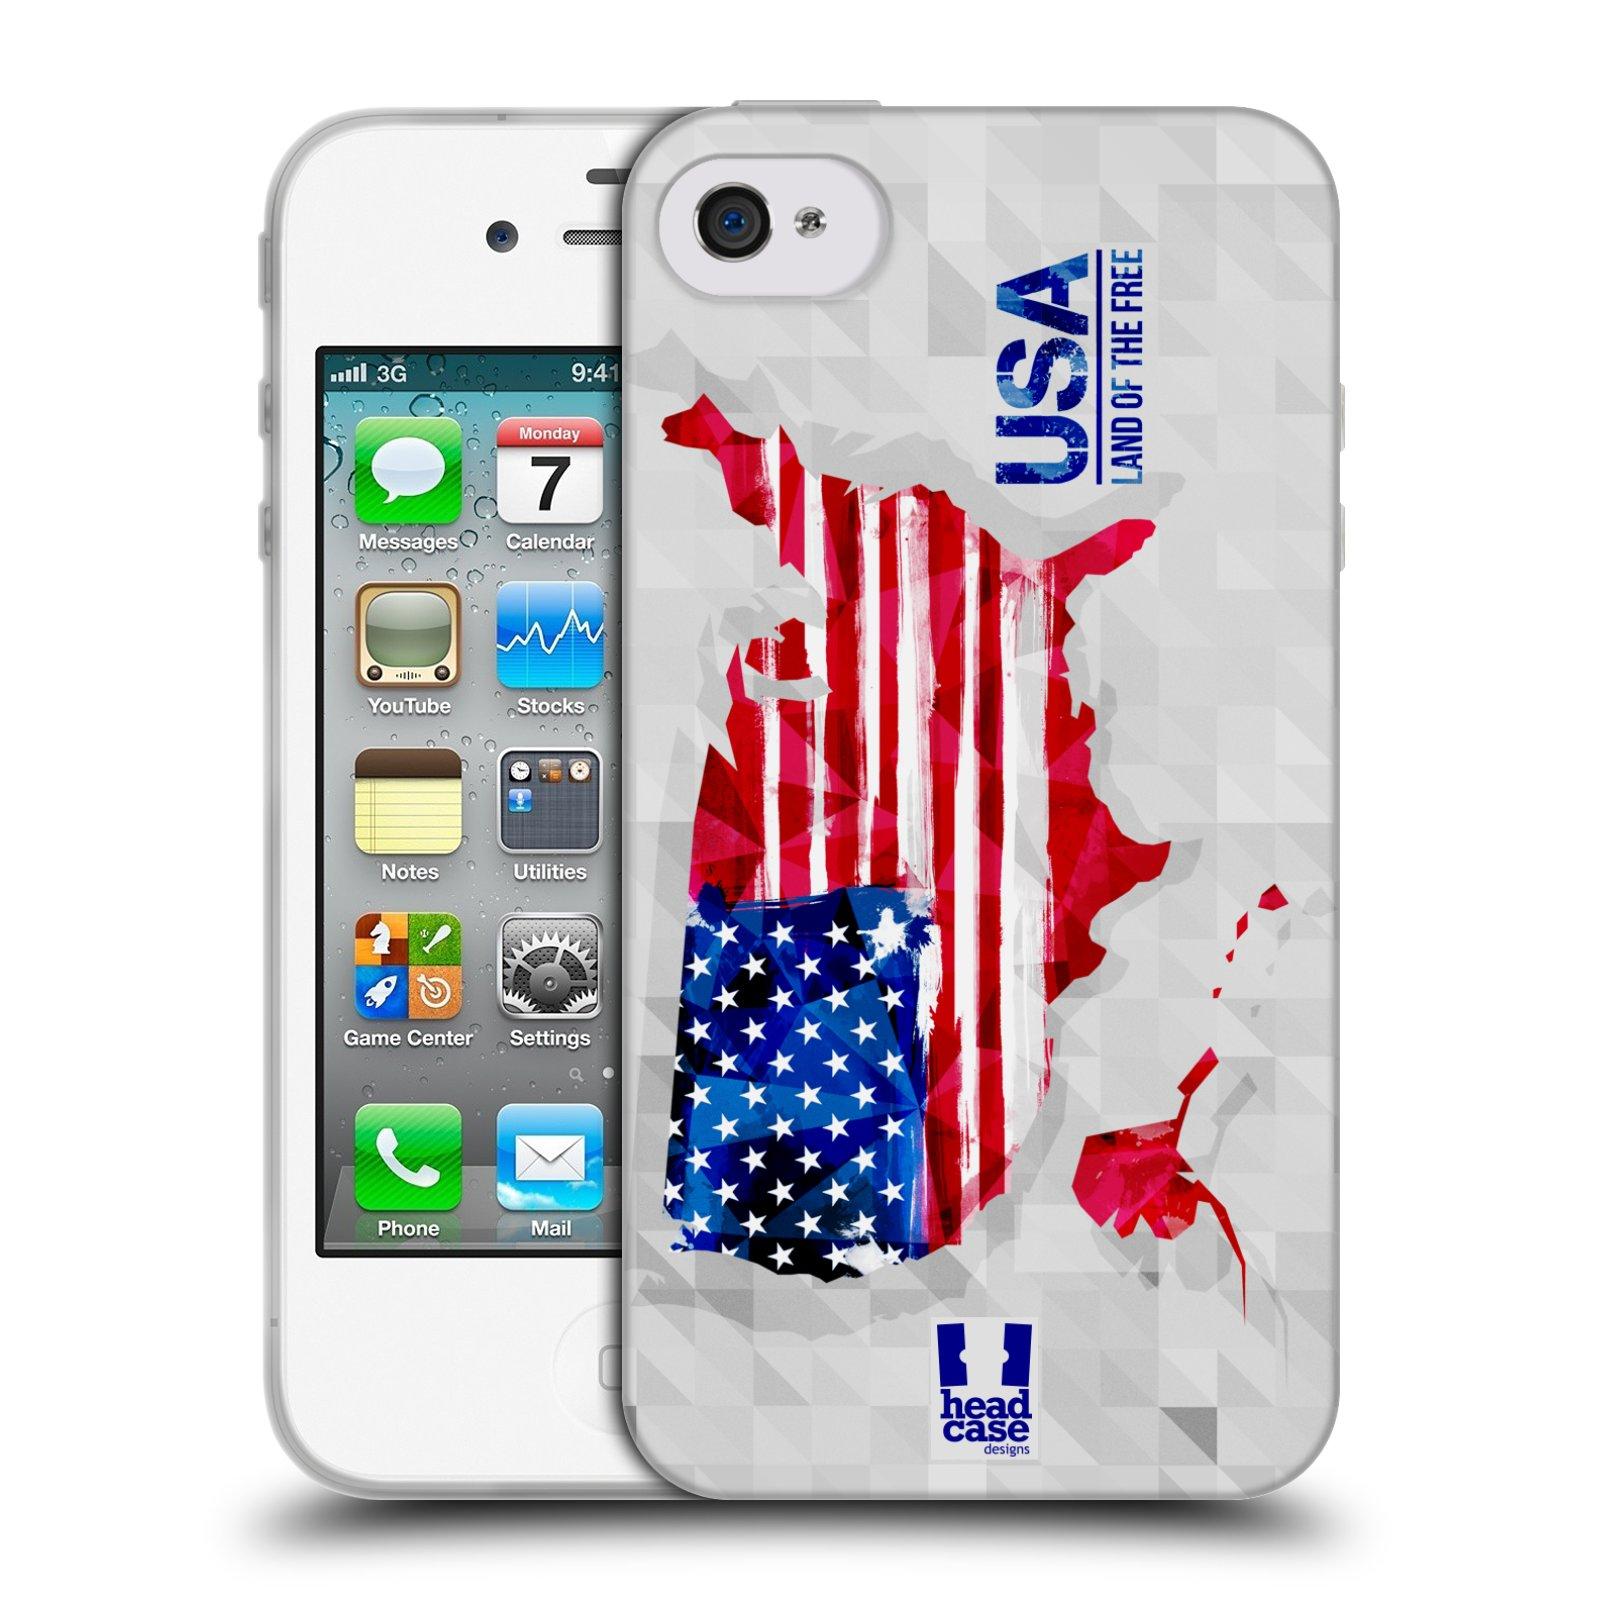 Silikonové pouzdro na mobil Apple iPhone 4 a 4S HEAD CASE GEOMAPA USA (Silikonový kryt či obal na mobilní telefon Apple iPhone 4 a 4S)